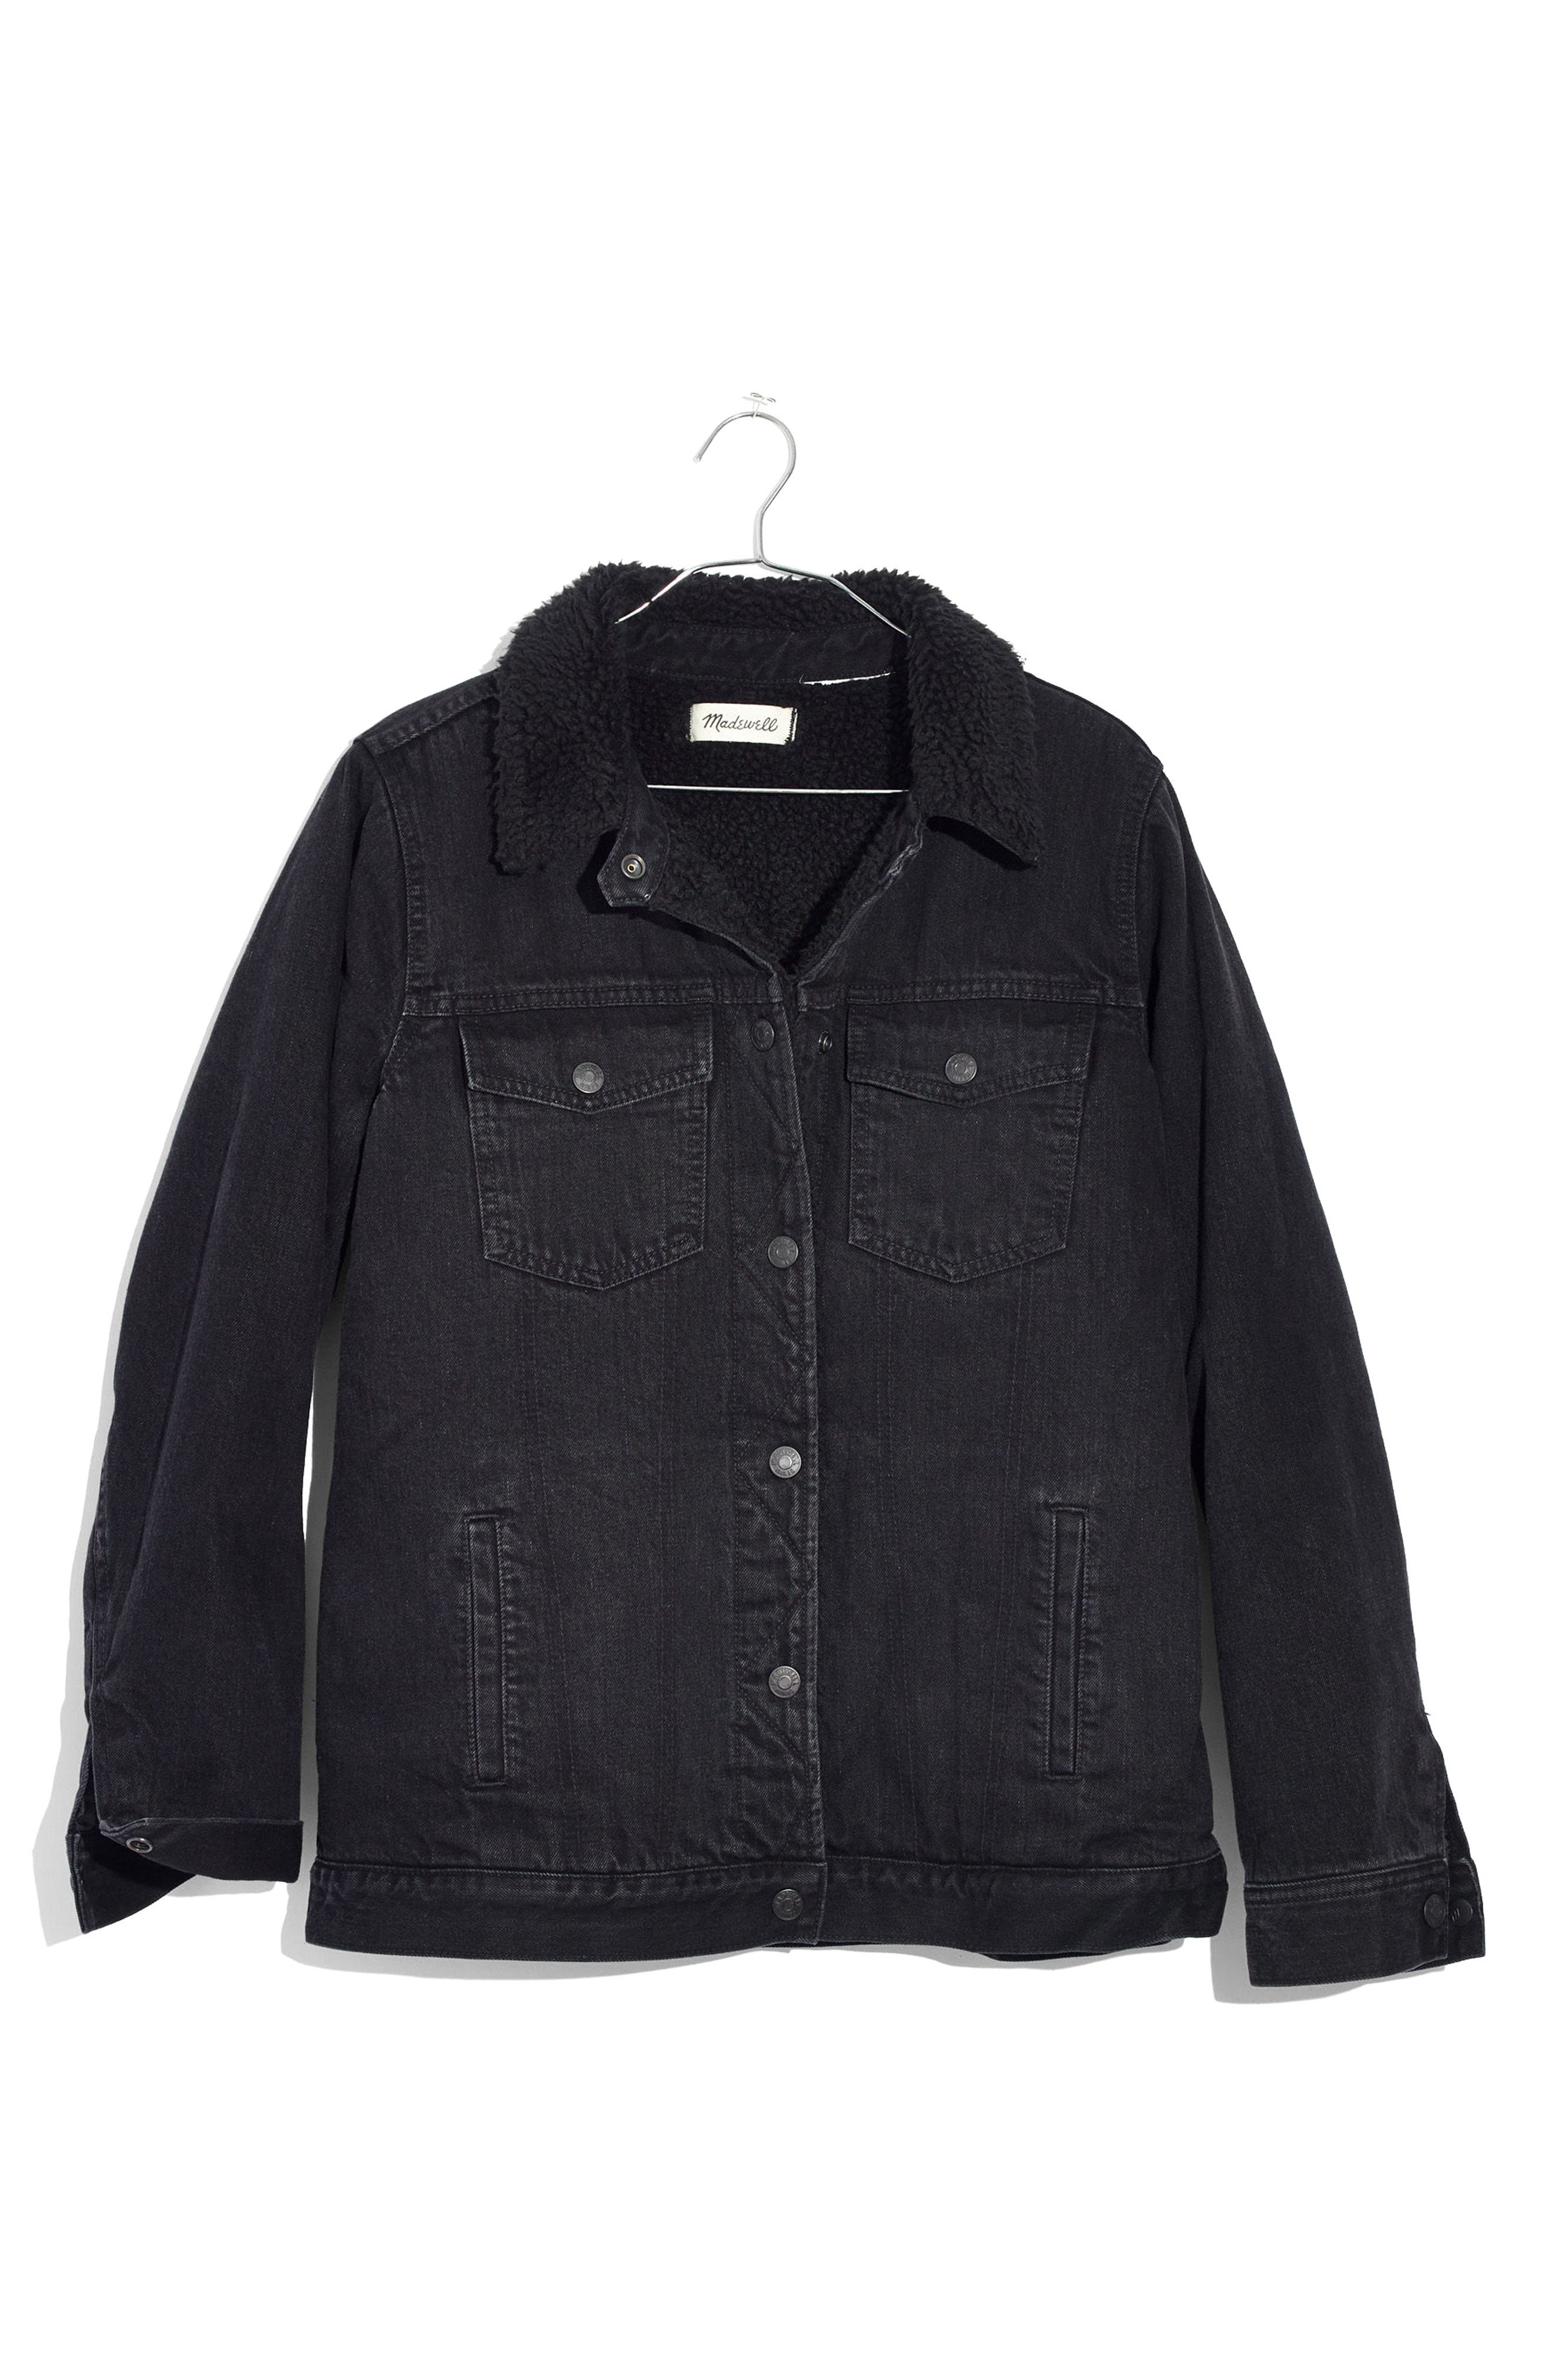 Main Image - Madewell Oversize Denim Jacket with Fleece Collar